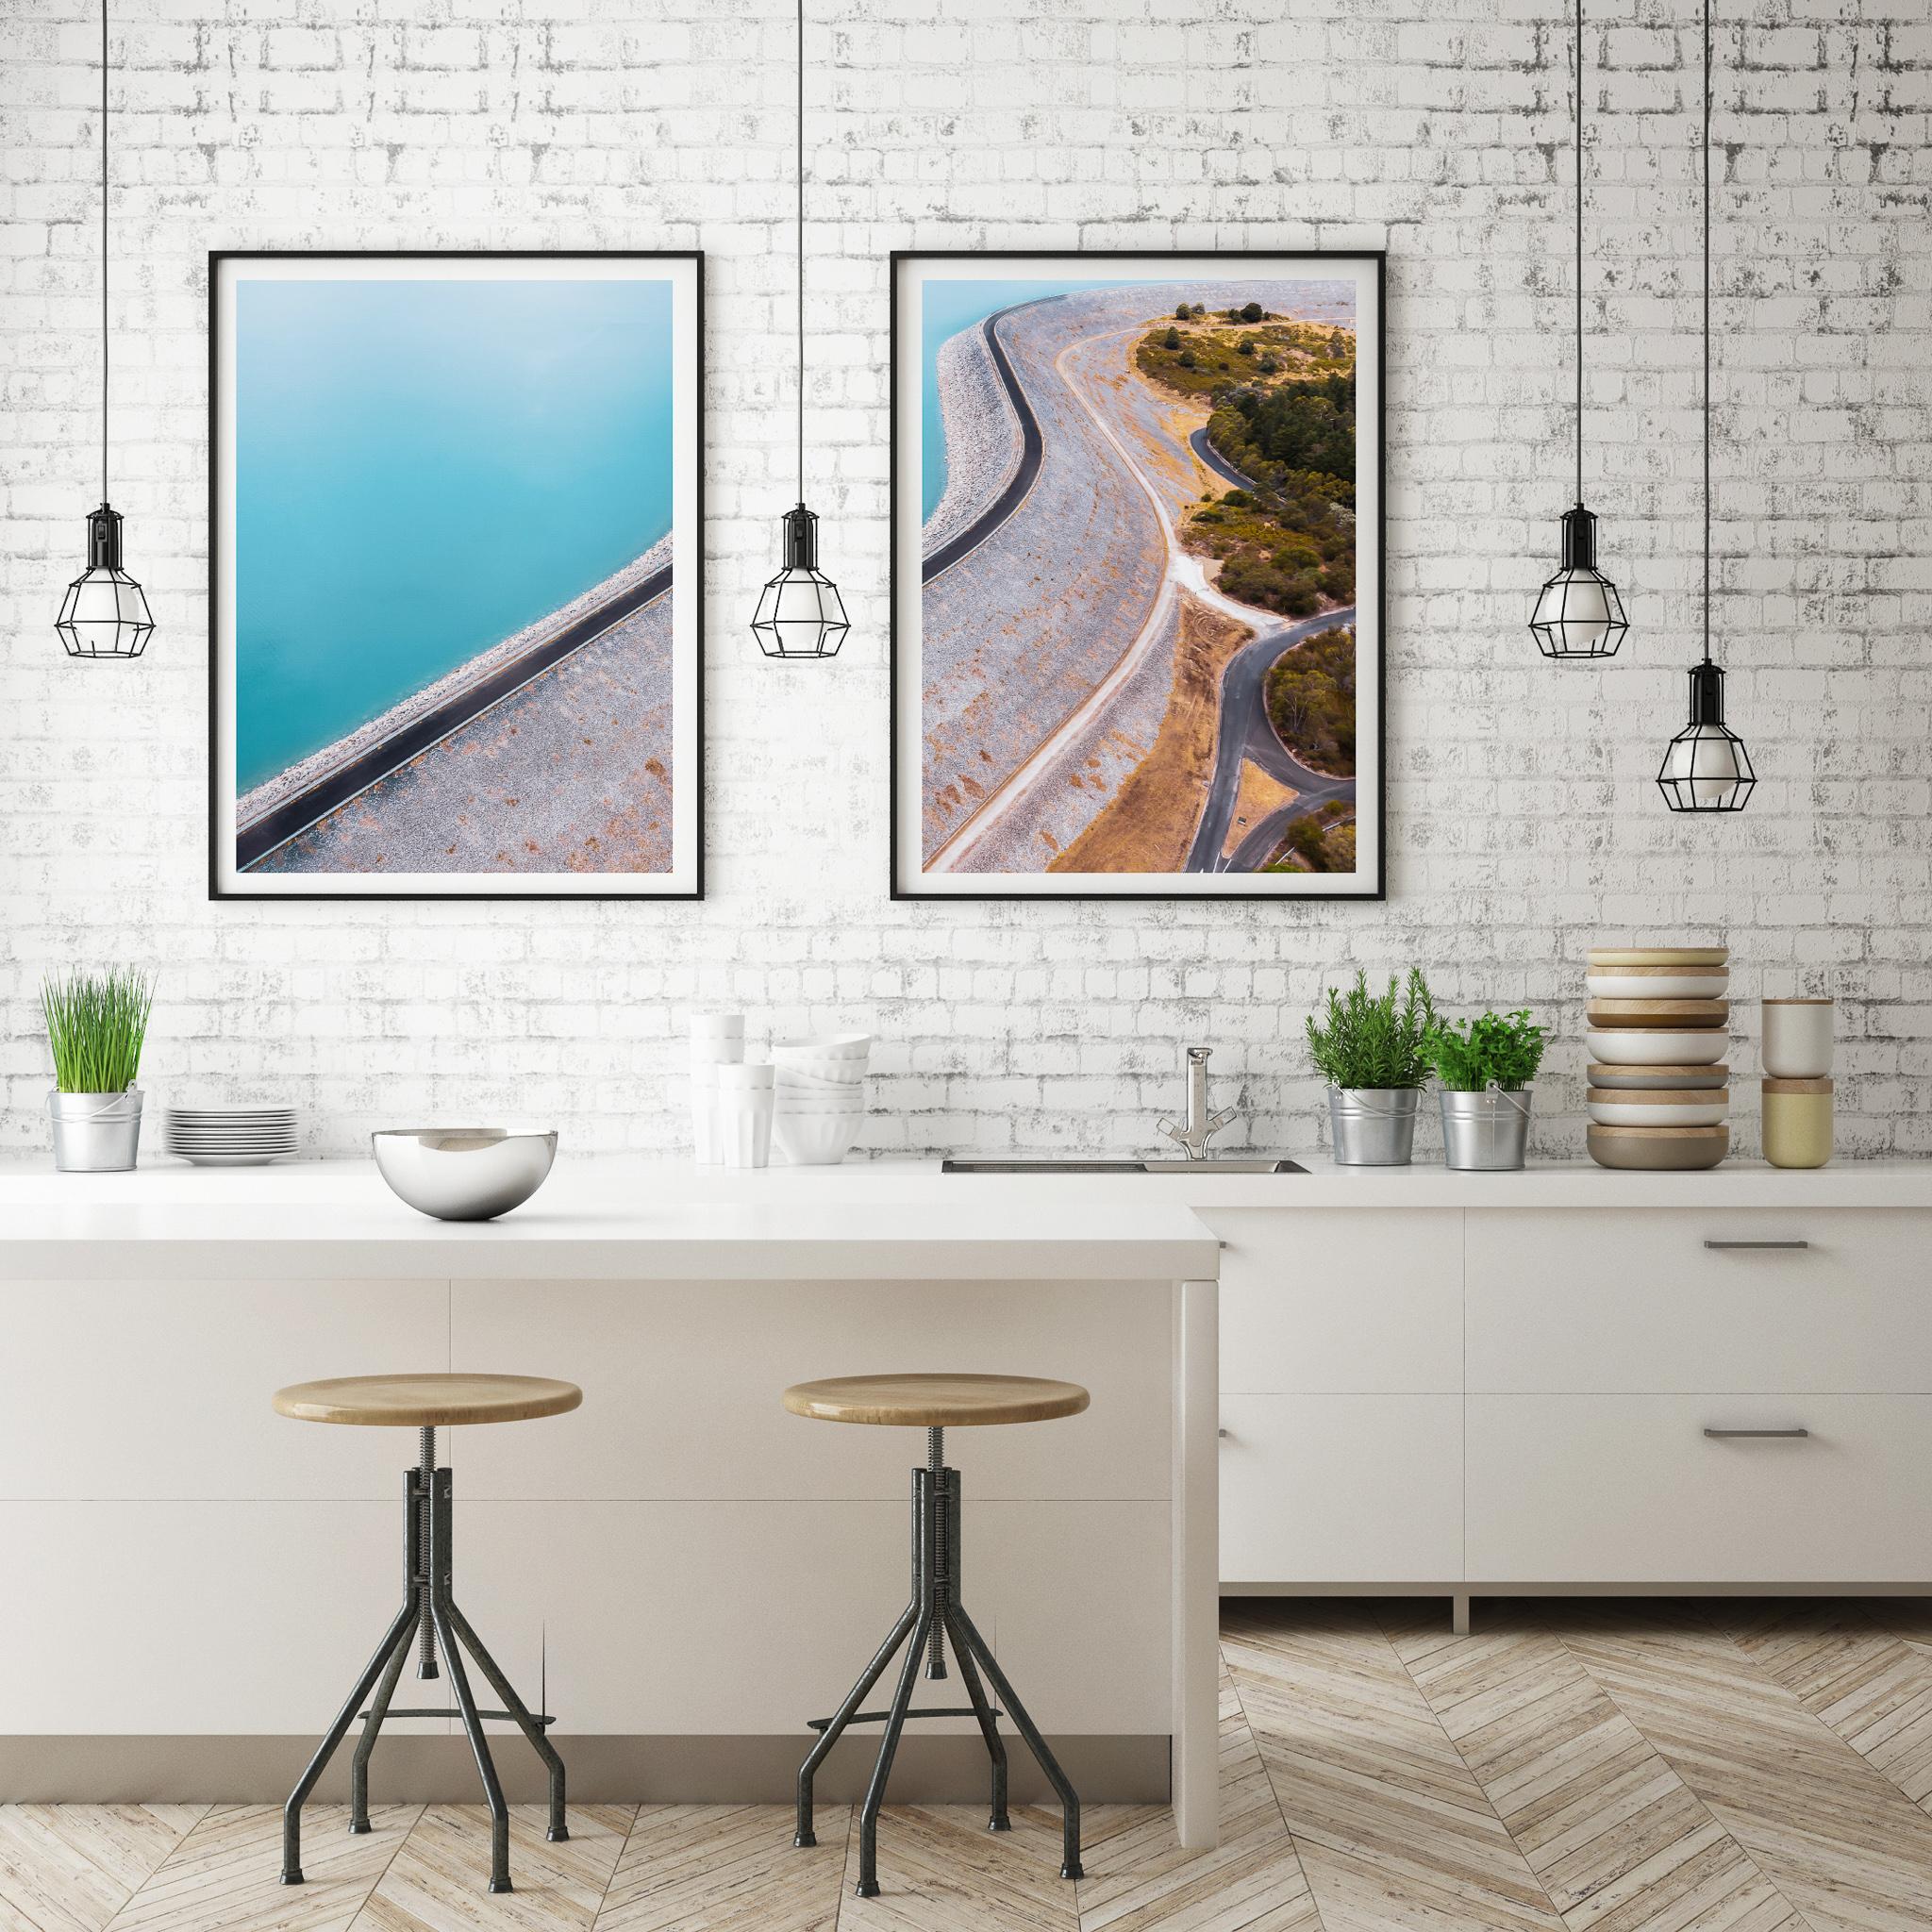 Mock Up Poster Frame In Kitchen Interior Background, Scandinavia